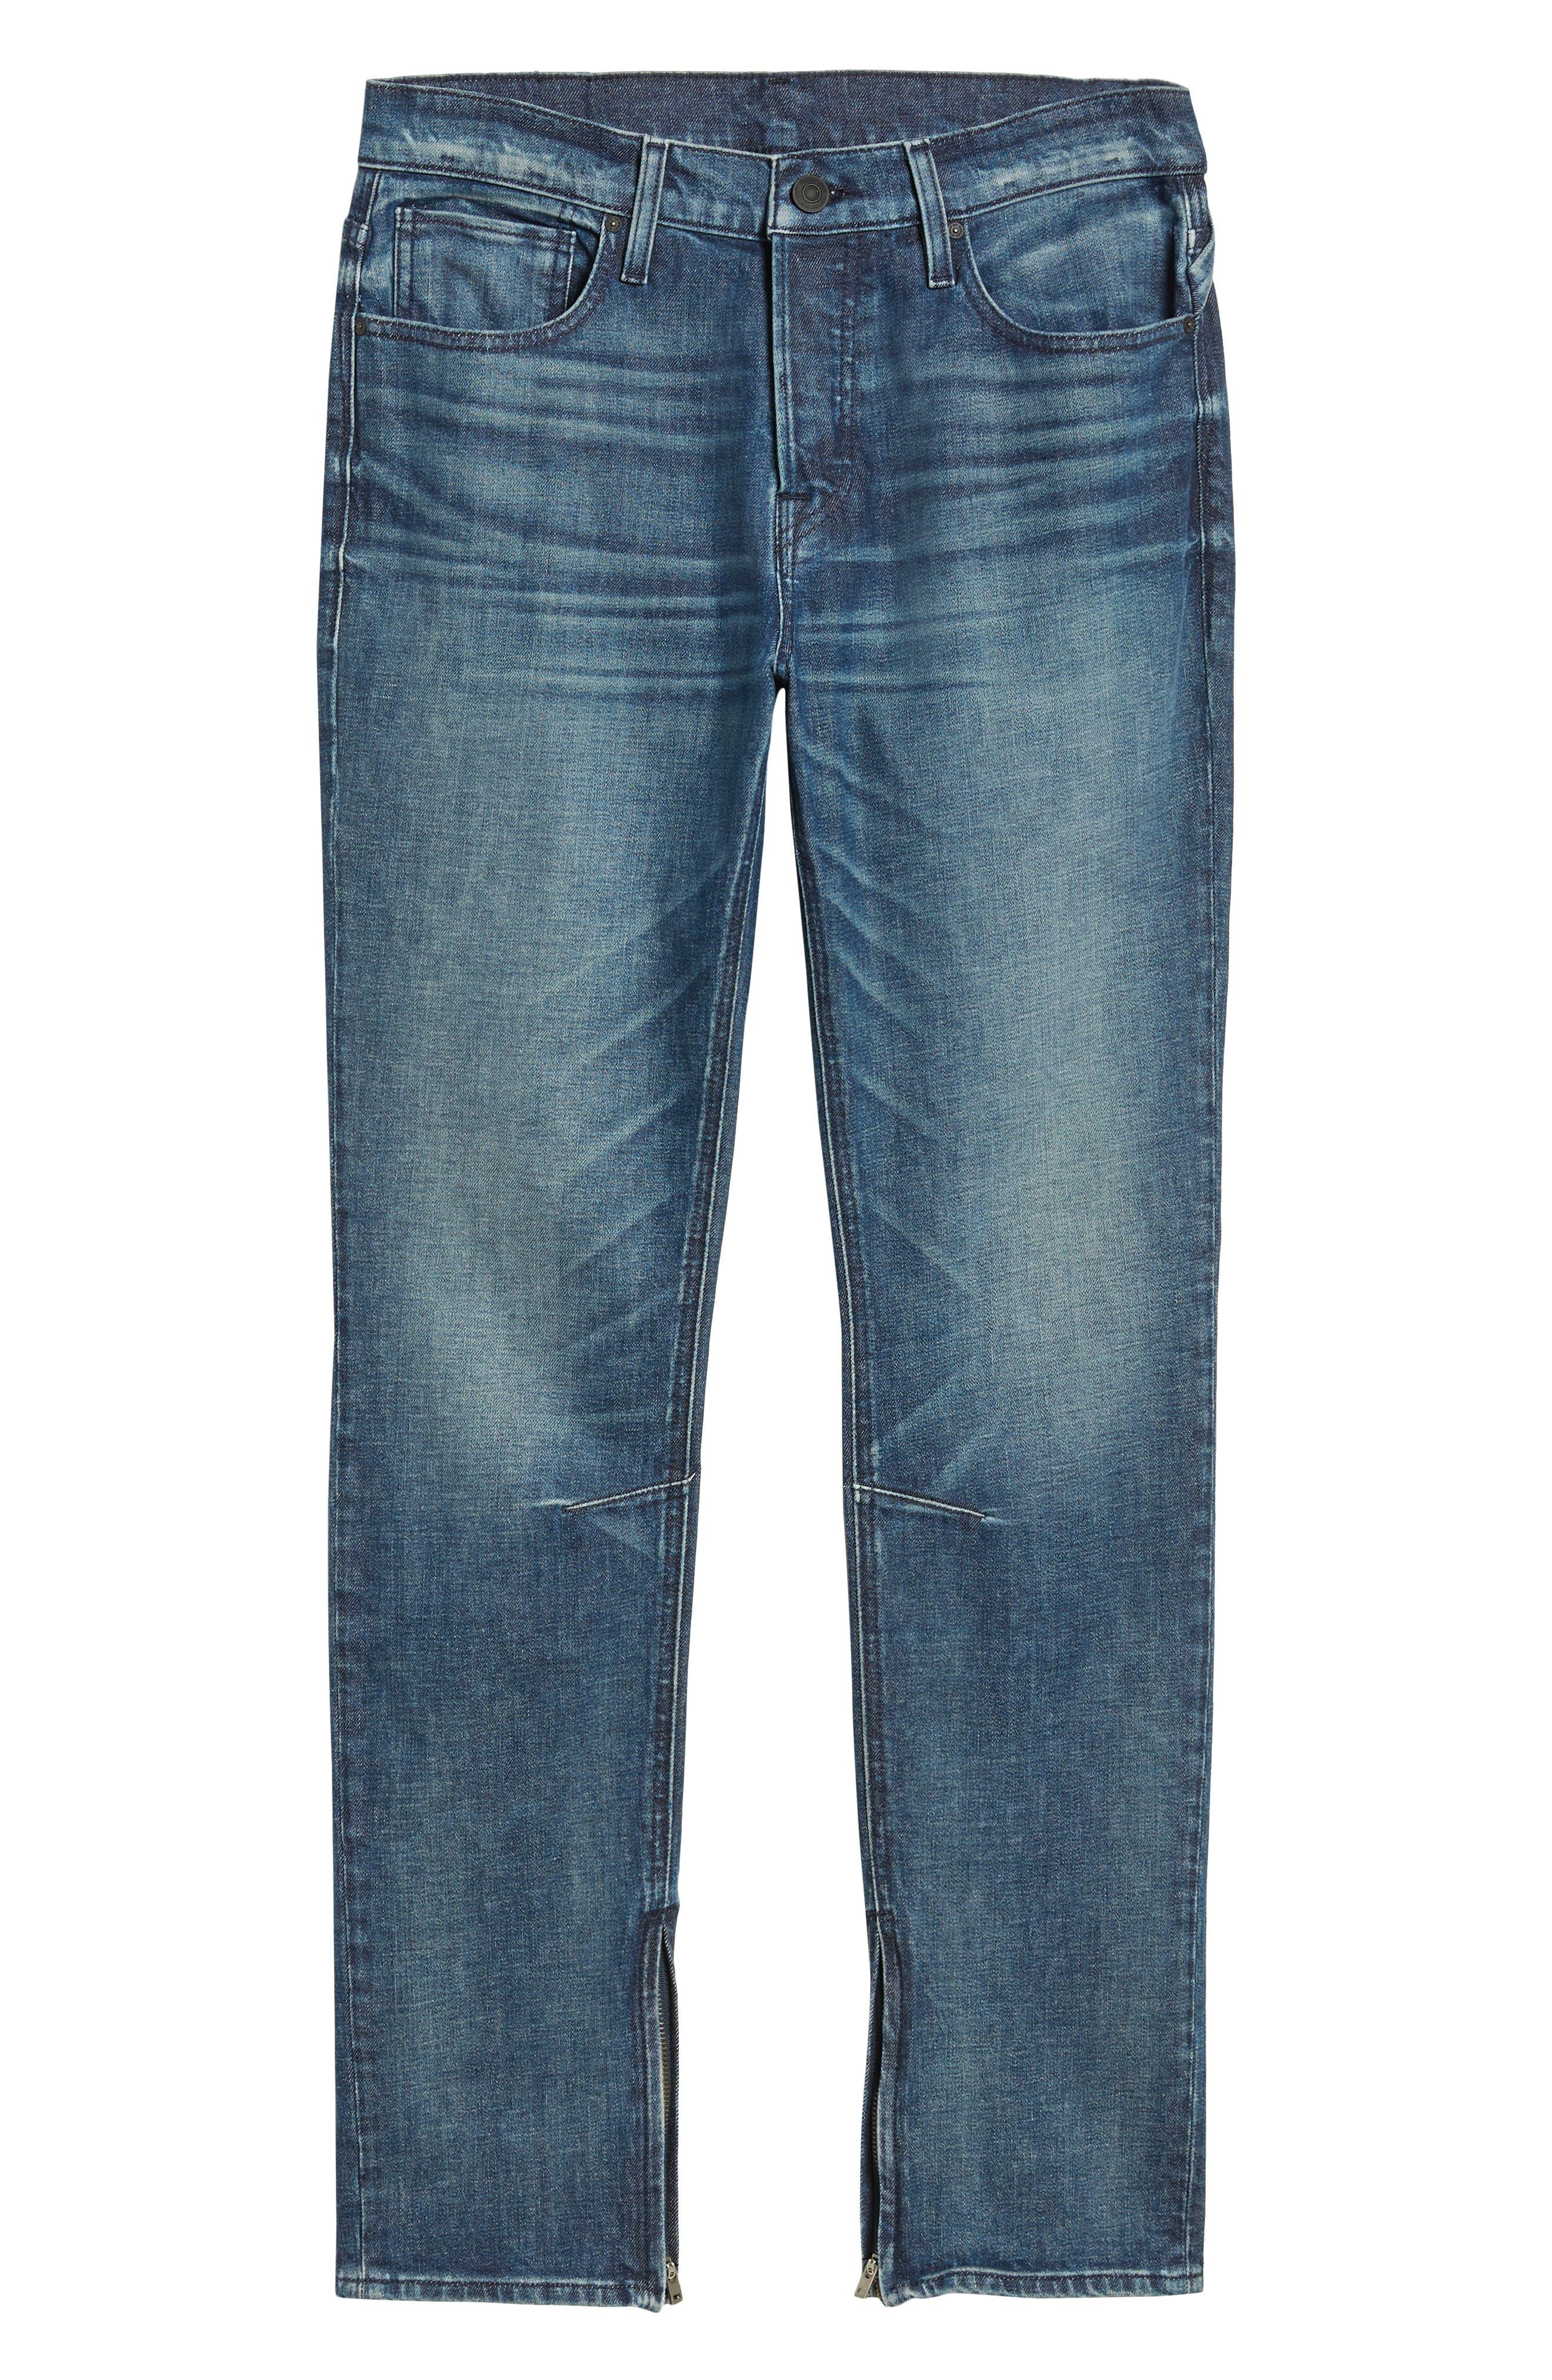 HUDSON JEANS,                             Vaughn Biker Skinny Fit Jeans,                             Alternate thumbnail 6, color,                             422